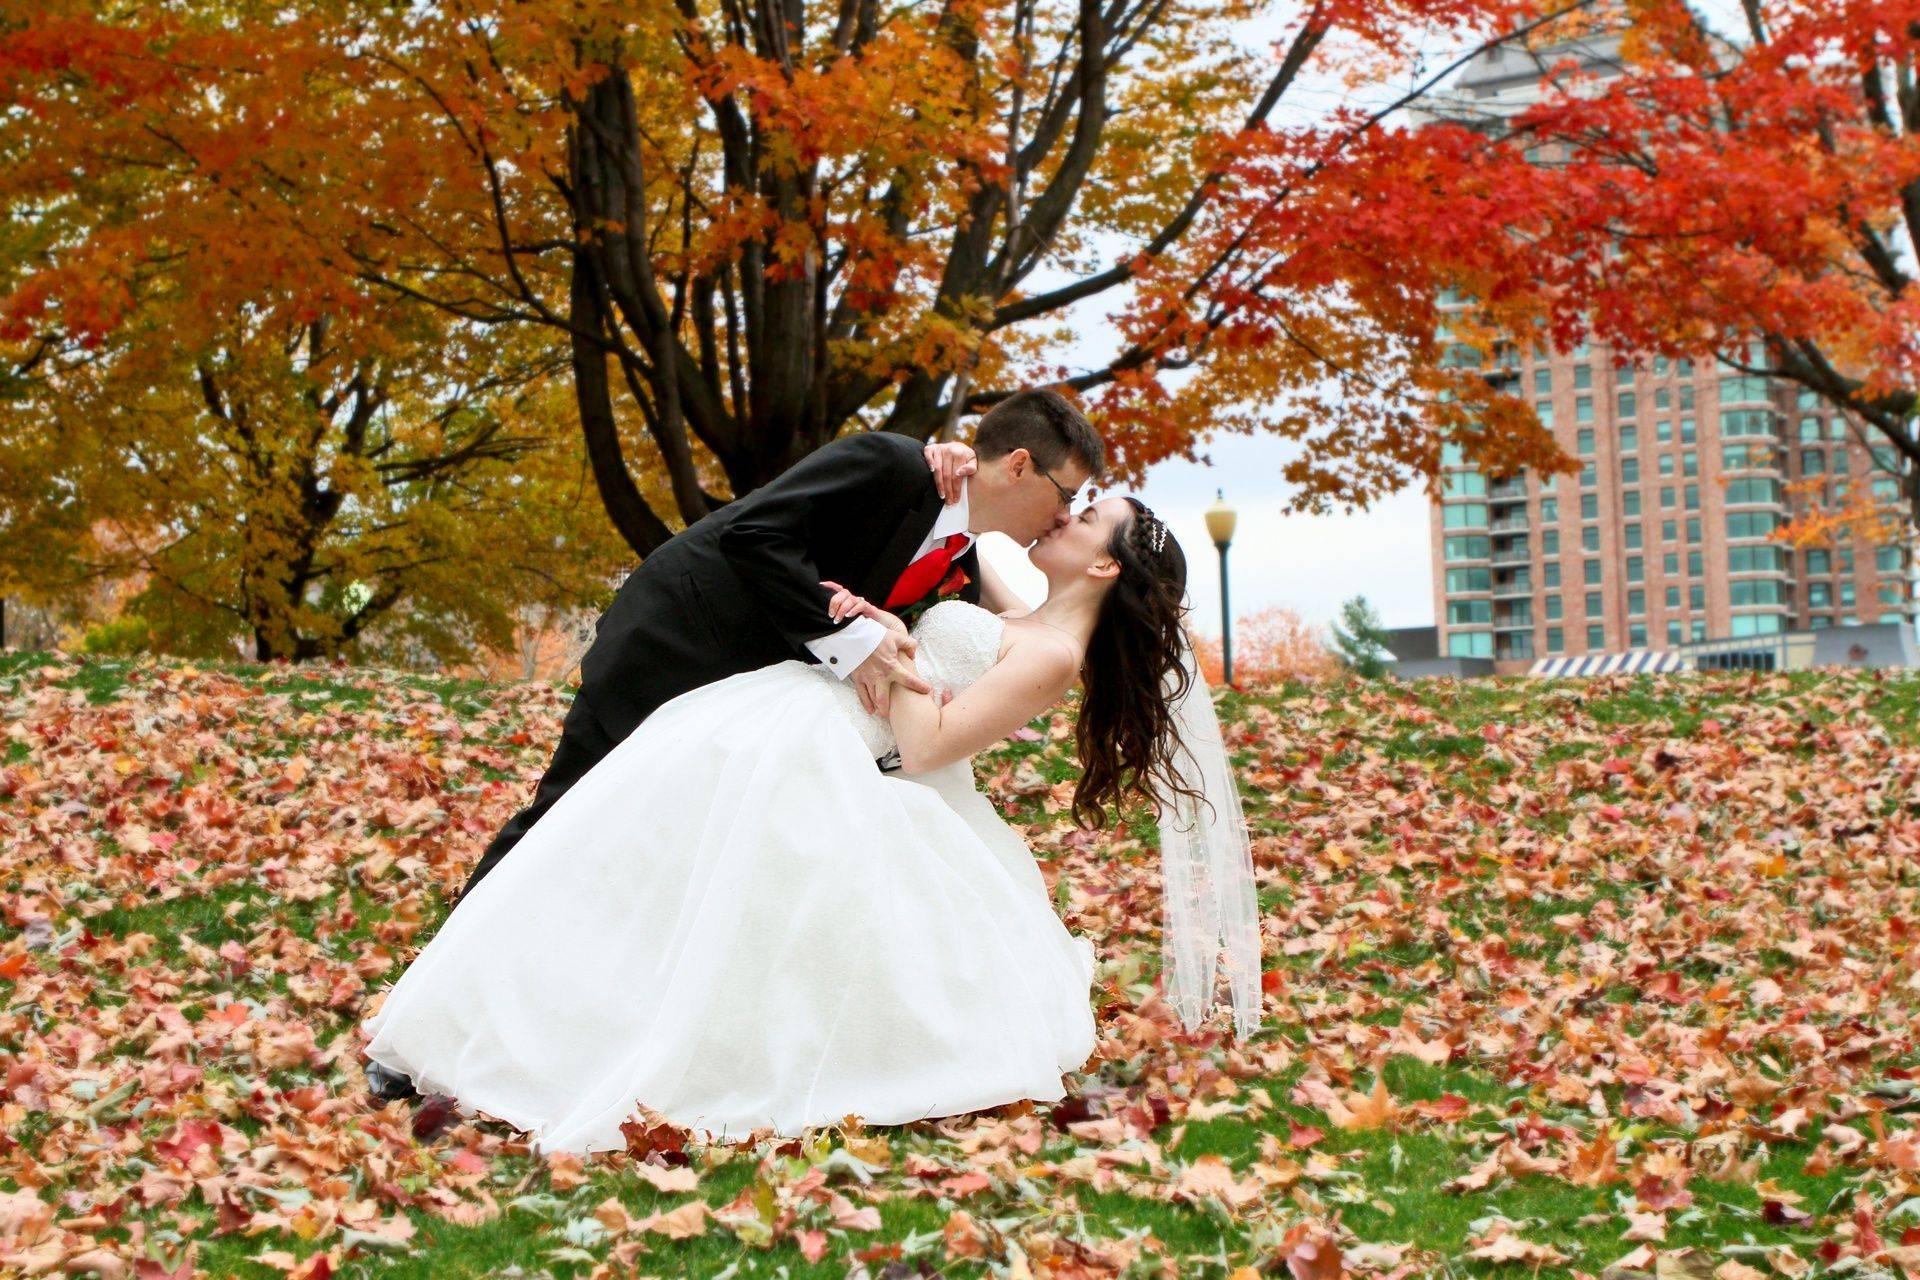 Brockville wedding photographer, Hardy Park Brockville Ontario, vertigo productions photography